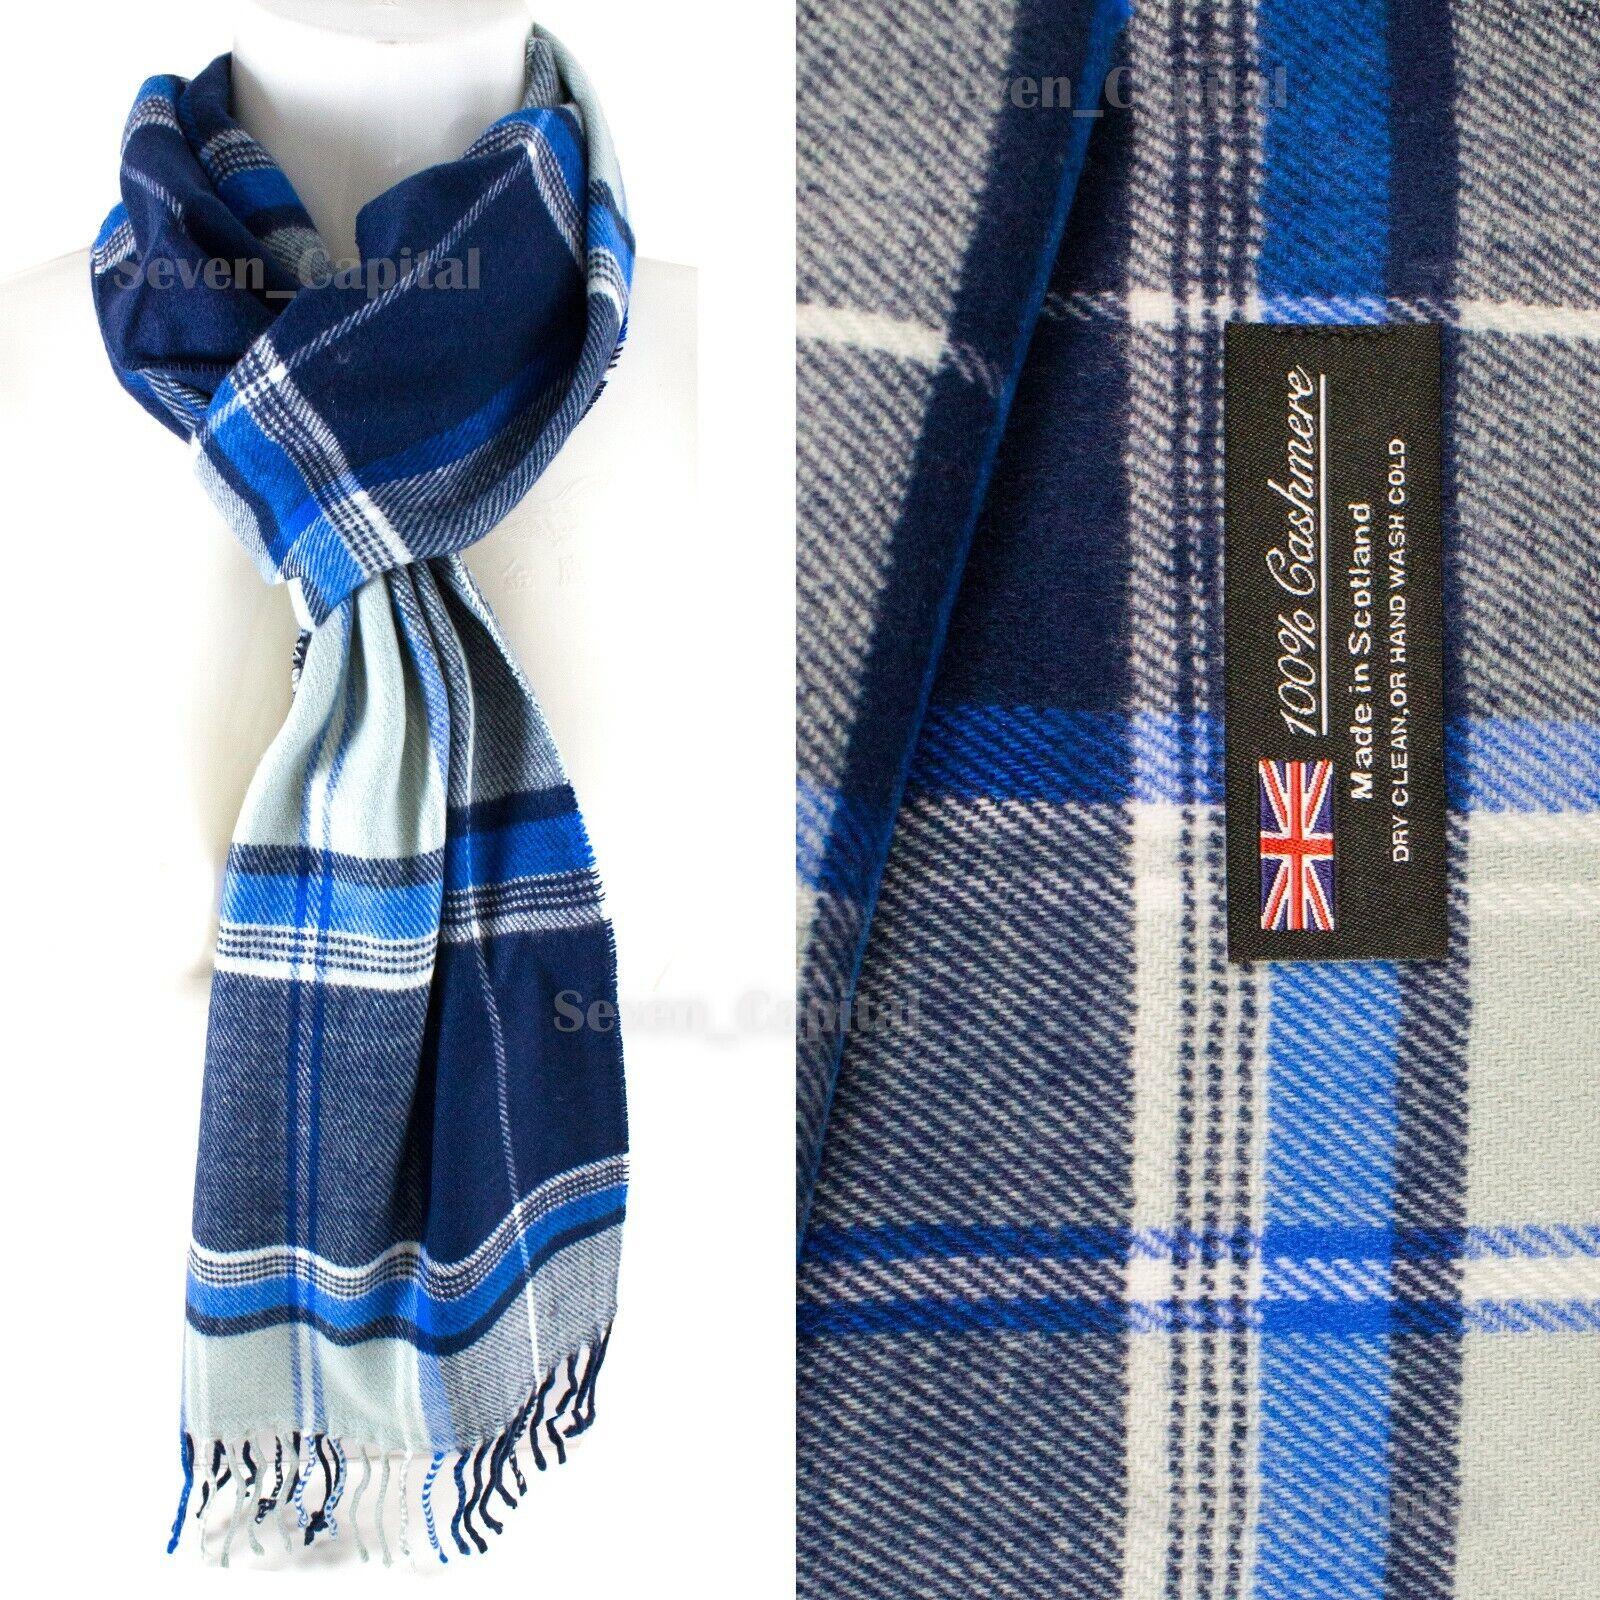 Mens Womens Winter Warm SCOTLAND Made 100% CASHMERE Scarf Scarves Plaid Wool 30. Plaid: Blue/White